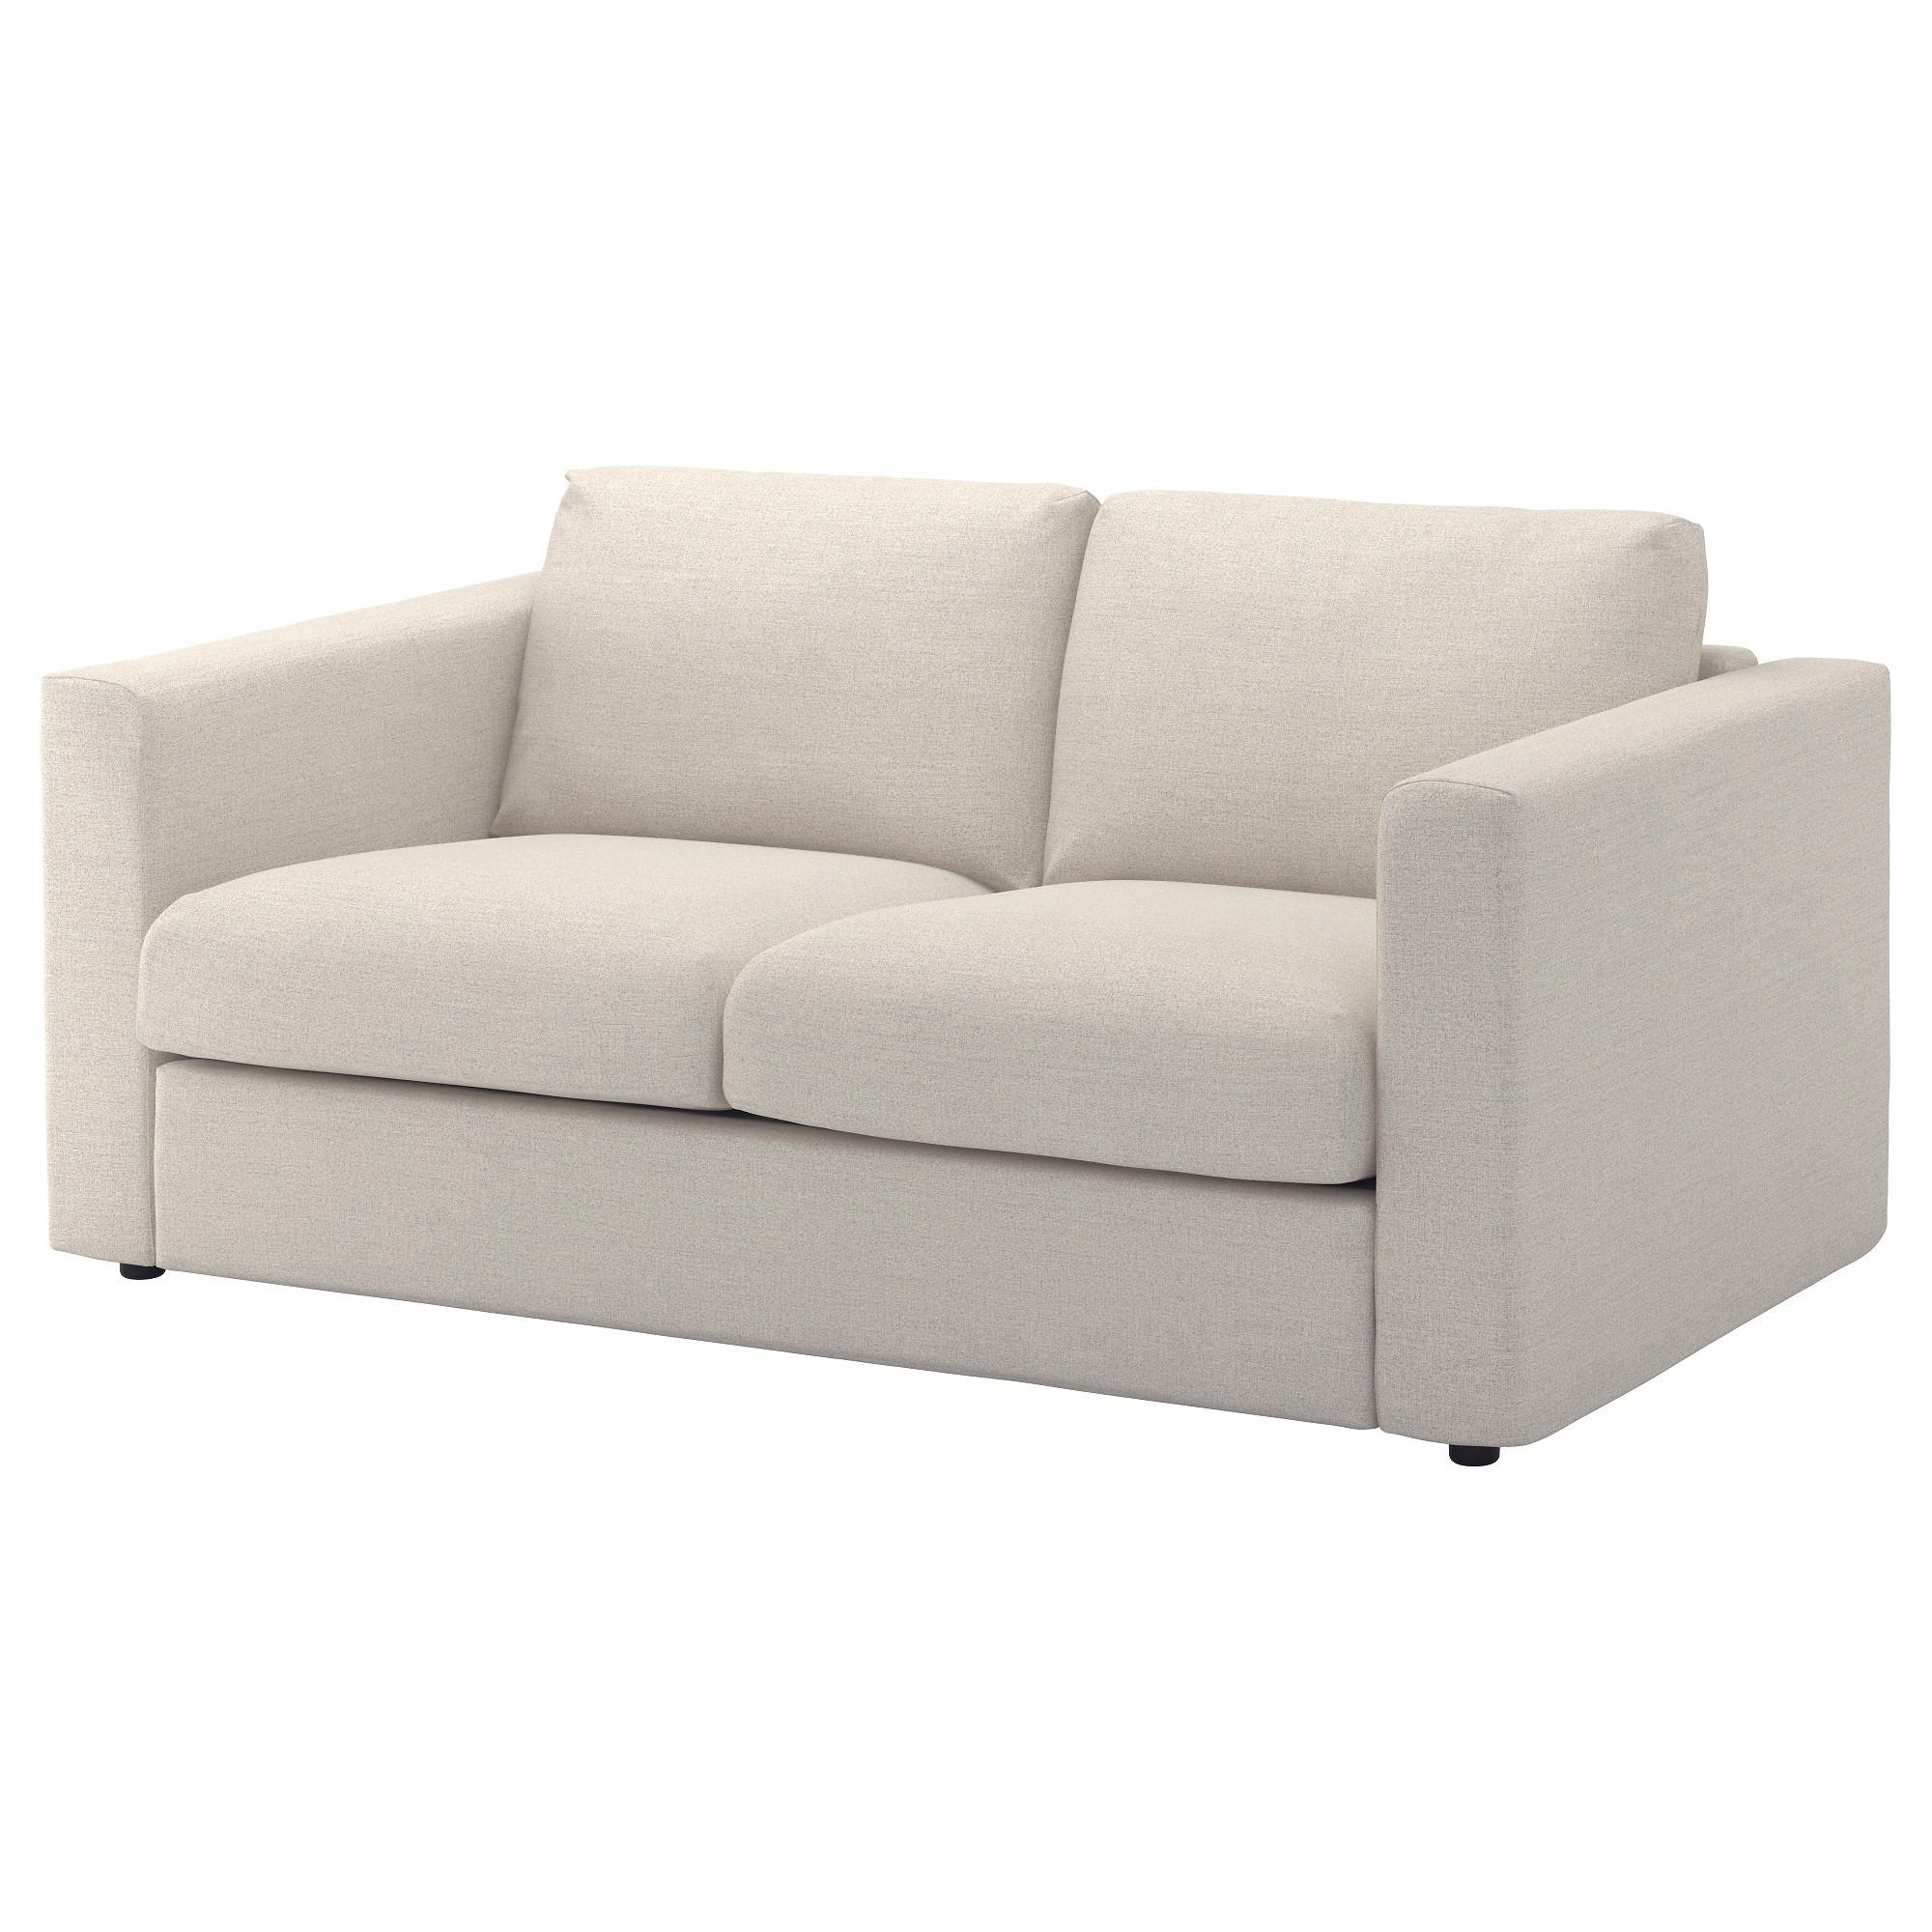 VIMLE 2-seat sofa